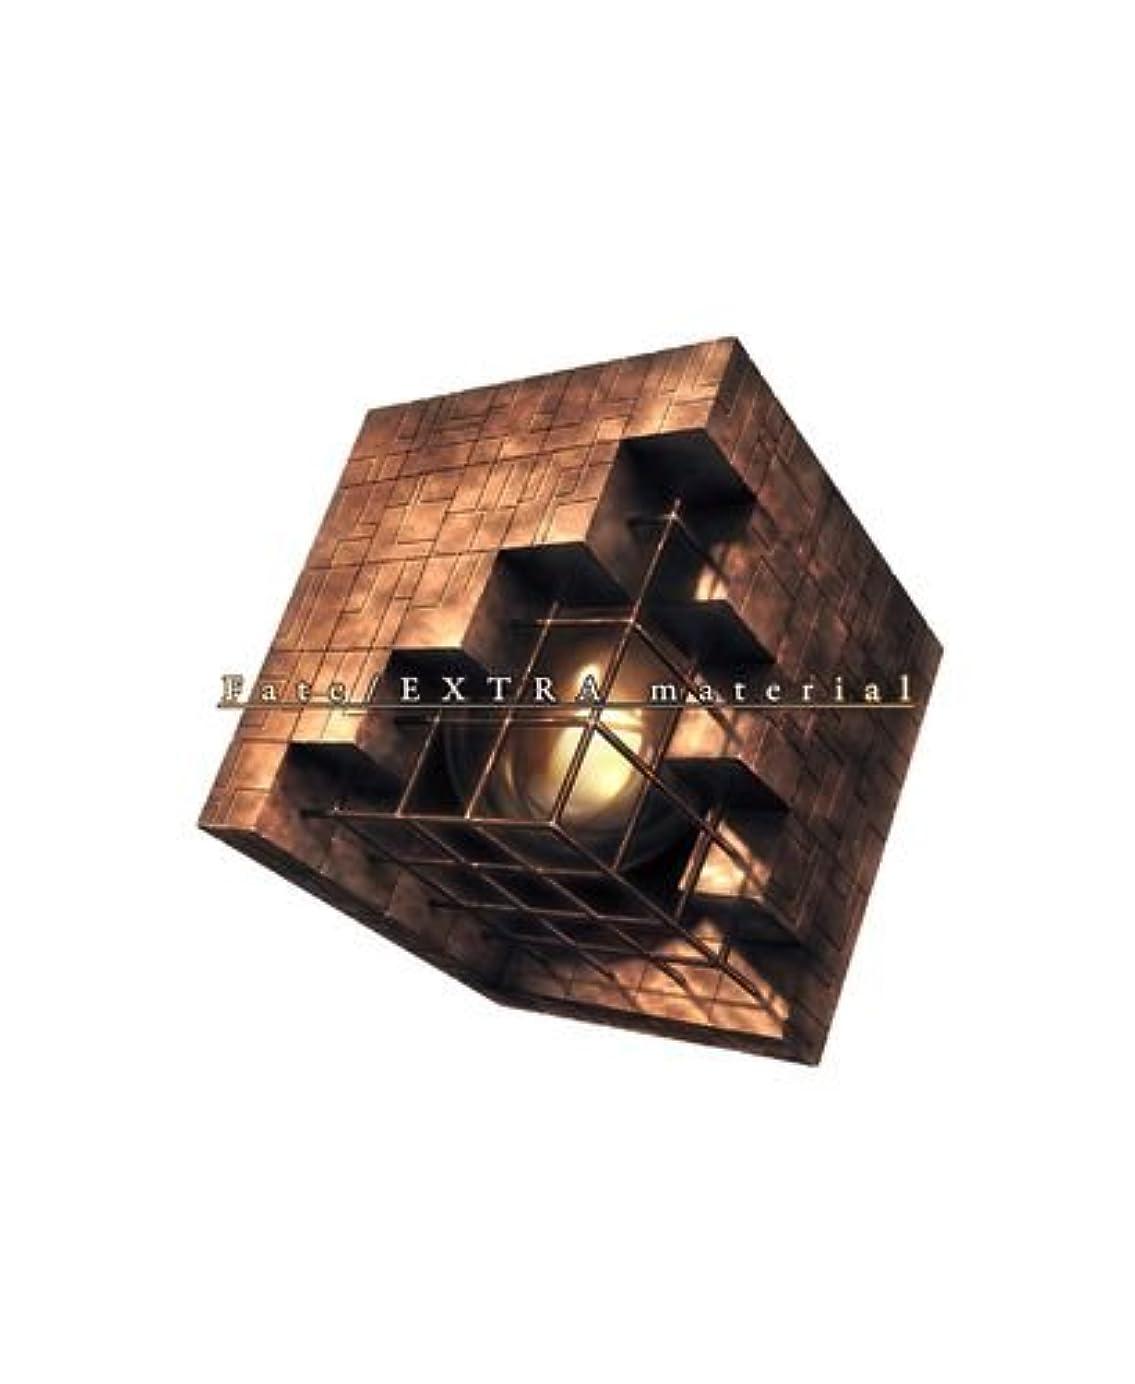 脱臼する農場任意Fate/EXTRA material 初回限定版【書籍】